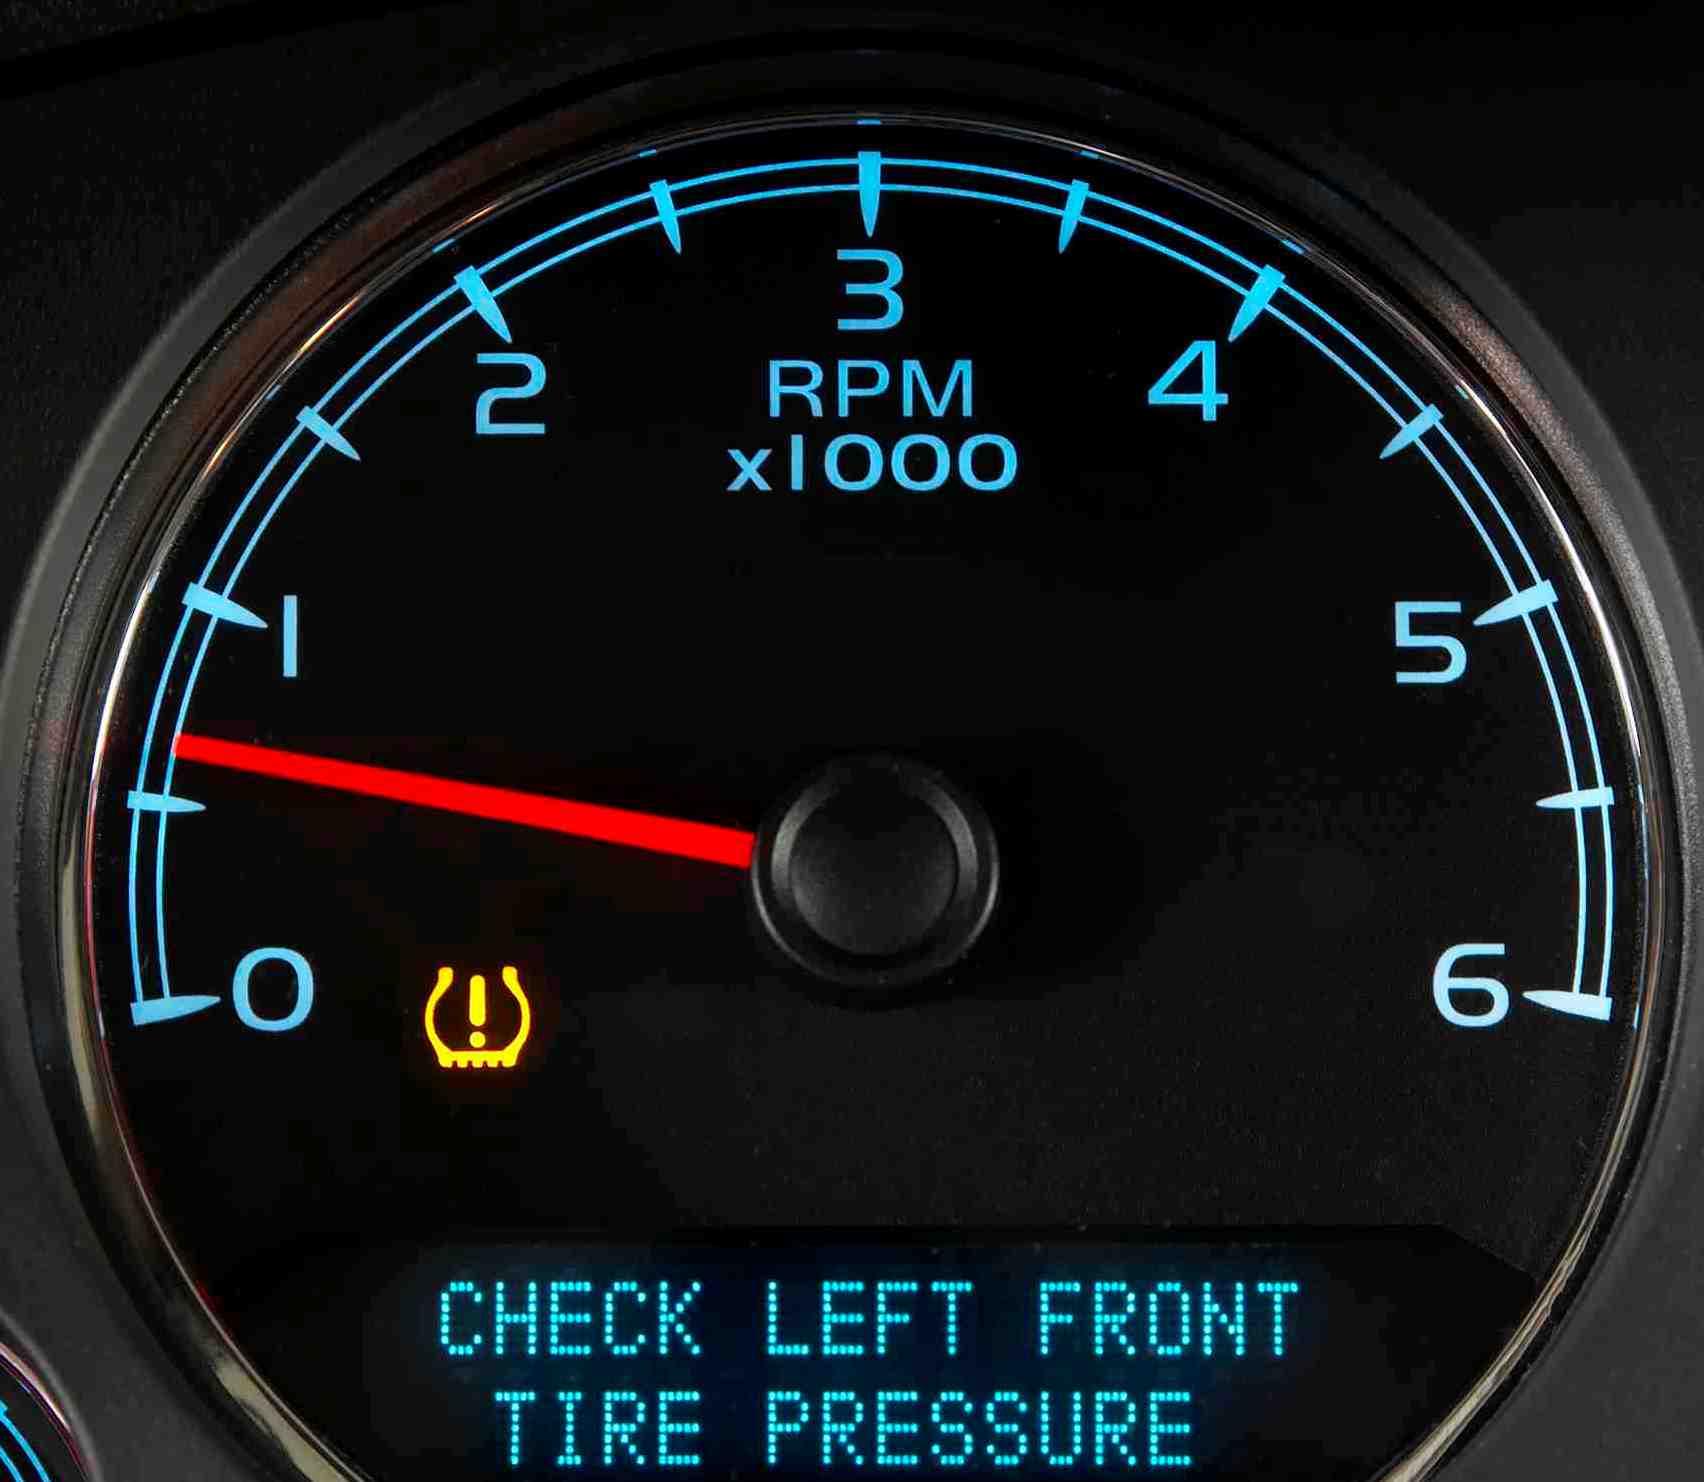 Tire Pressure Warning1